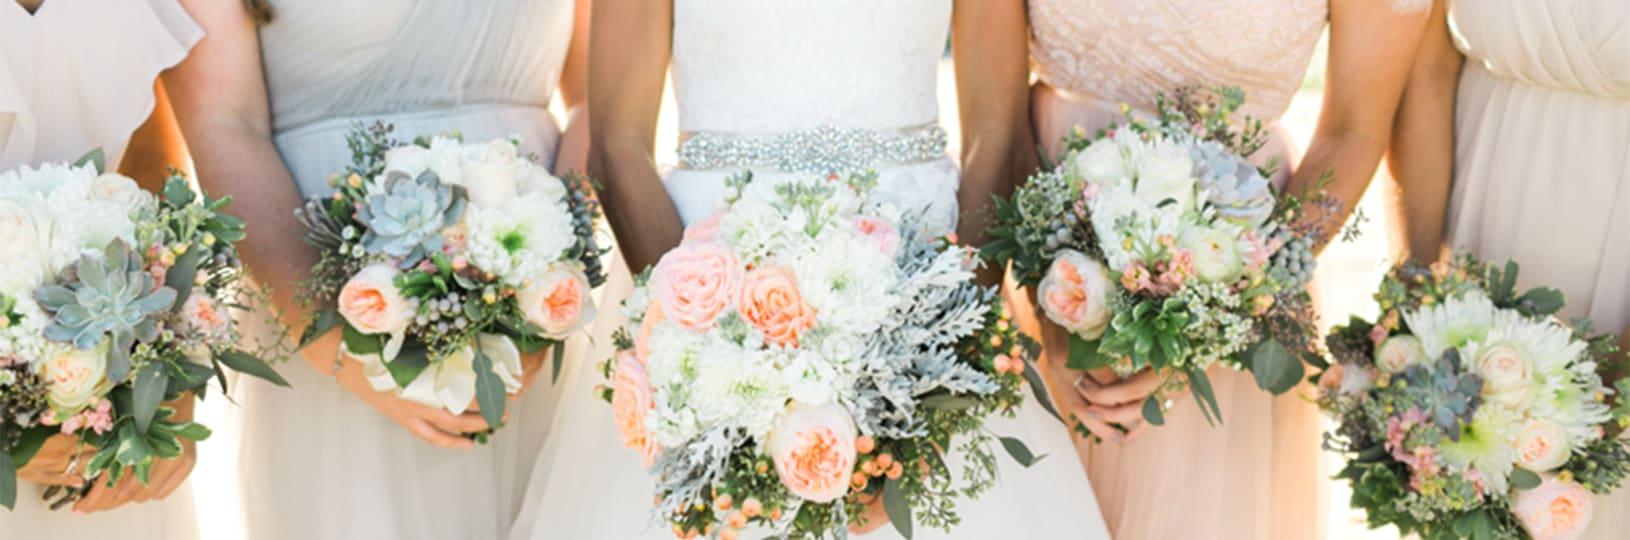 Bridesmaids wearing modern wedding jewelry.